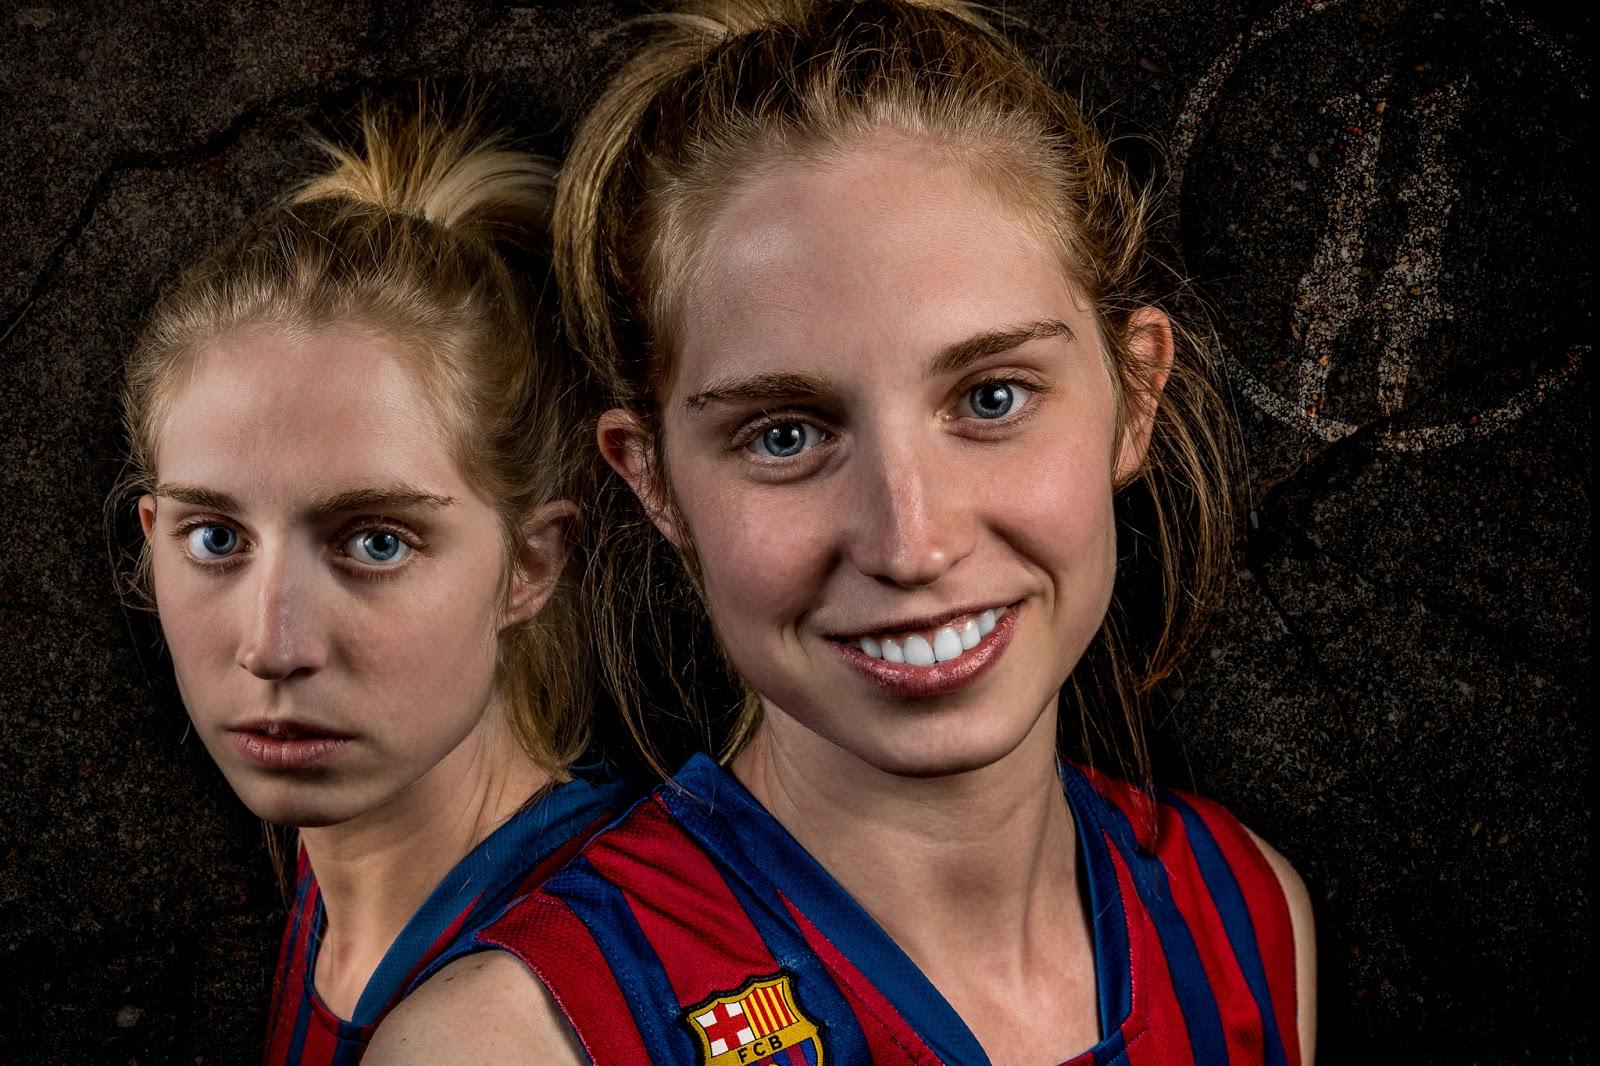 Marta 11 - CBS Barça Senior Femenino A - 2013 :: 2 x Canon EOS 5D MkIII | ISO100 | Canon 24-105 @47&50mm | f/11 | 1/60s